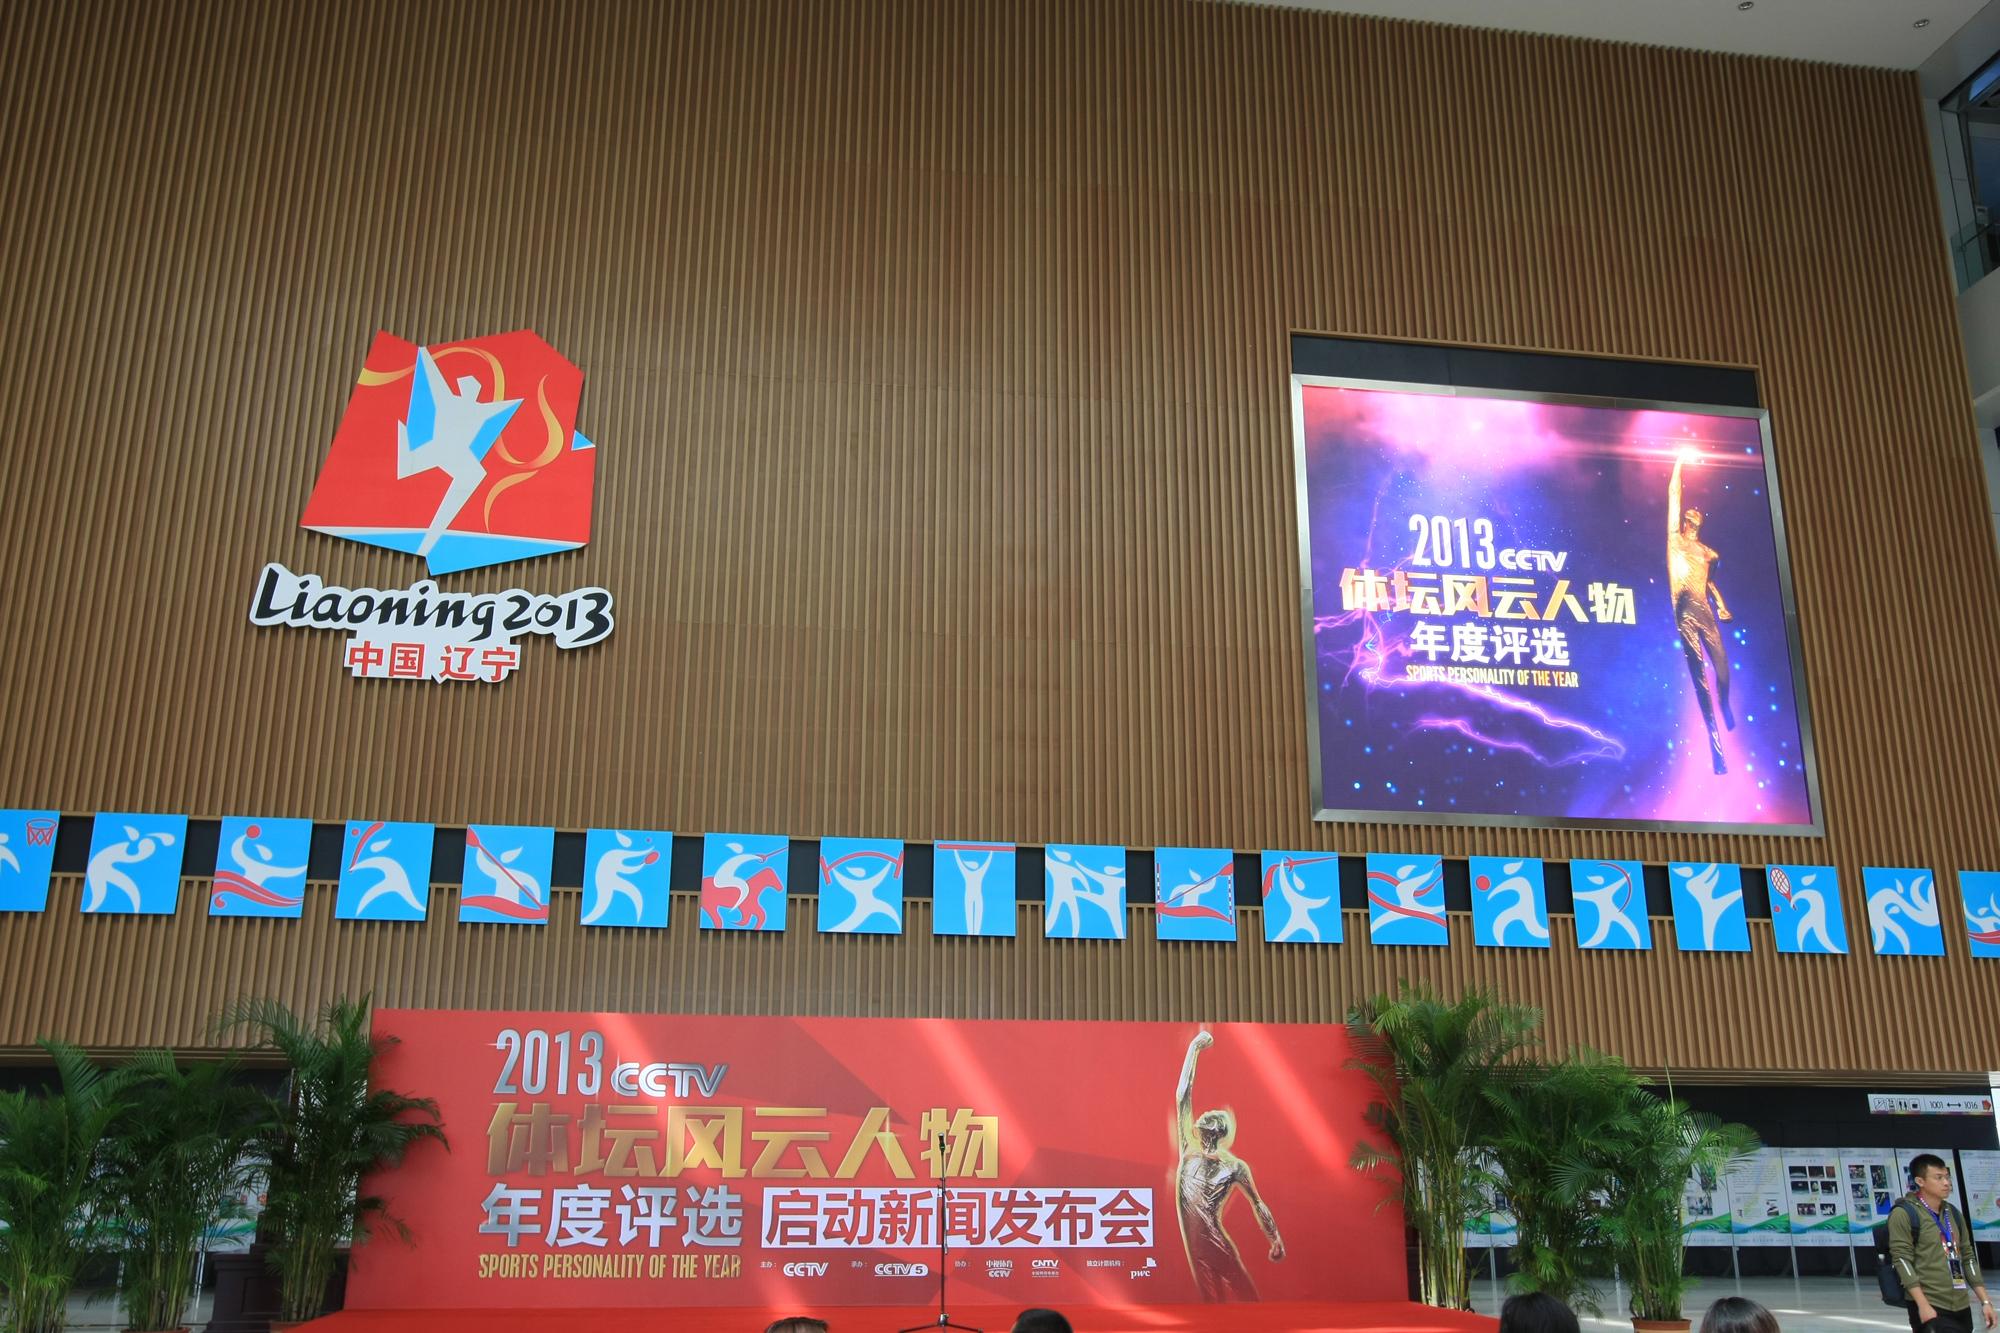 2013 CCTV体坛风云人物年度评选活动在沈阳启动